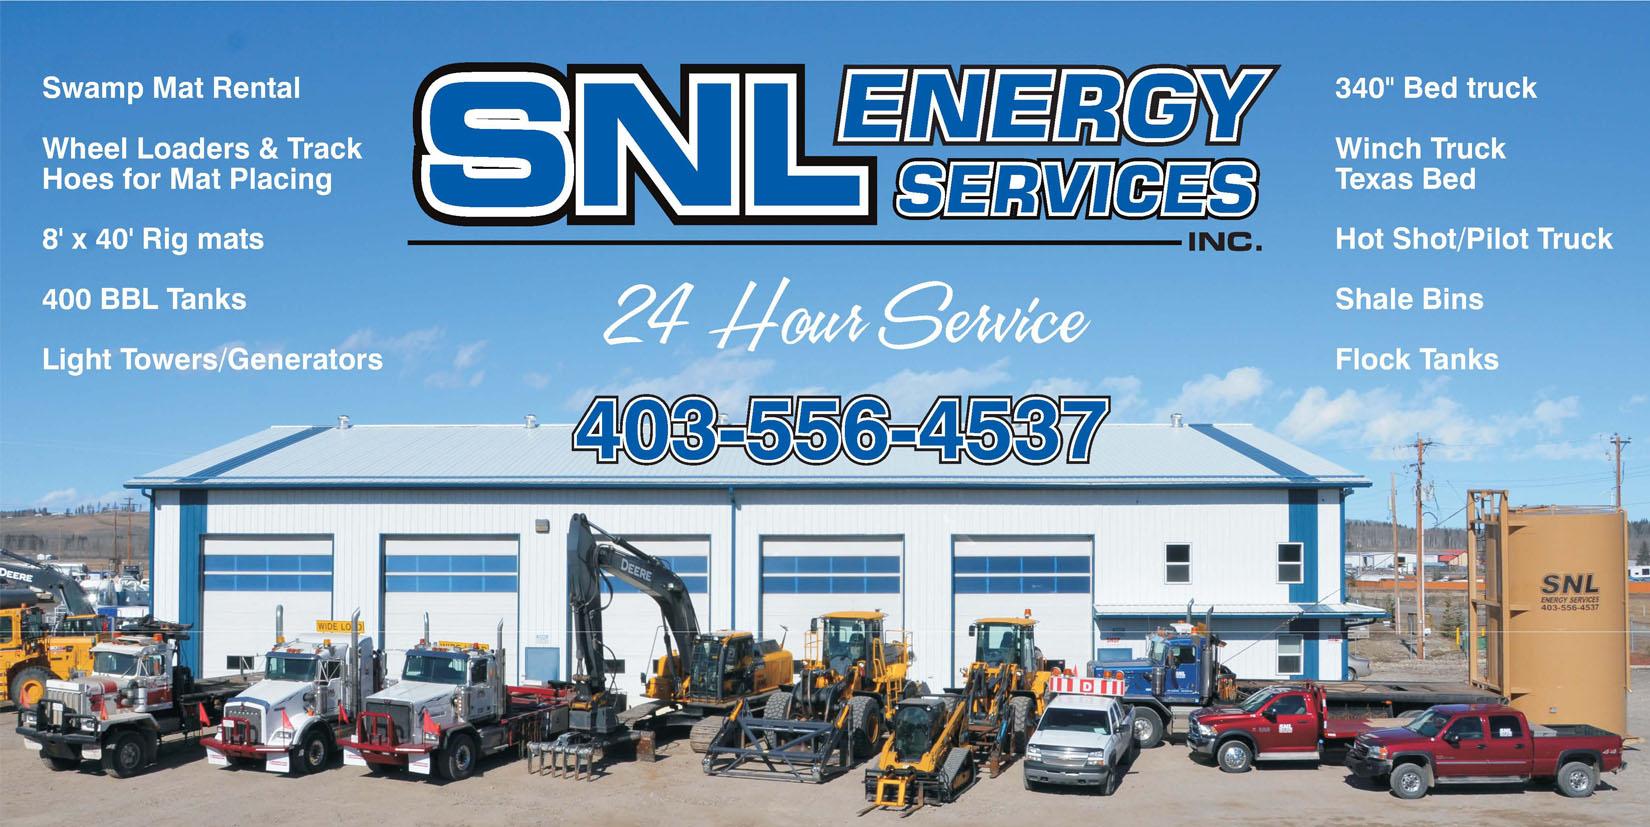 Snl Energy Services Inc Snl Energy Services Inc